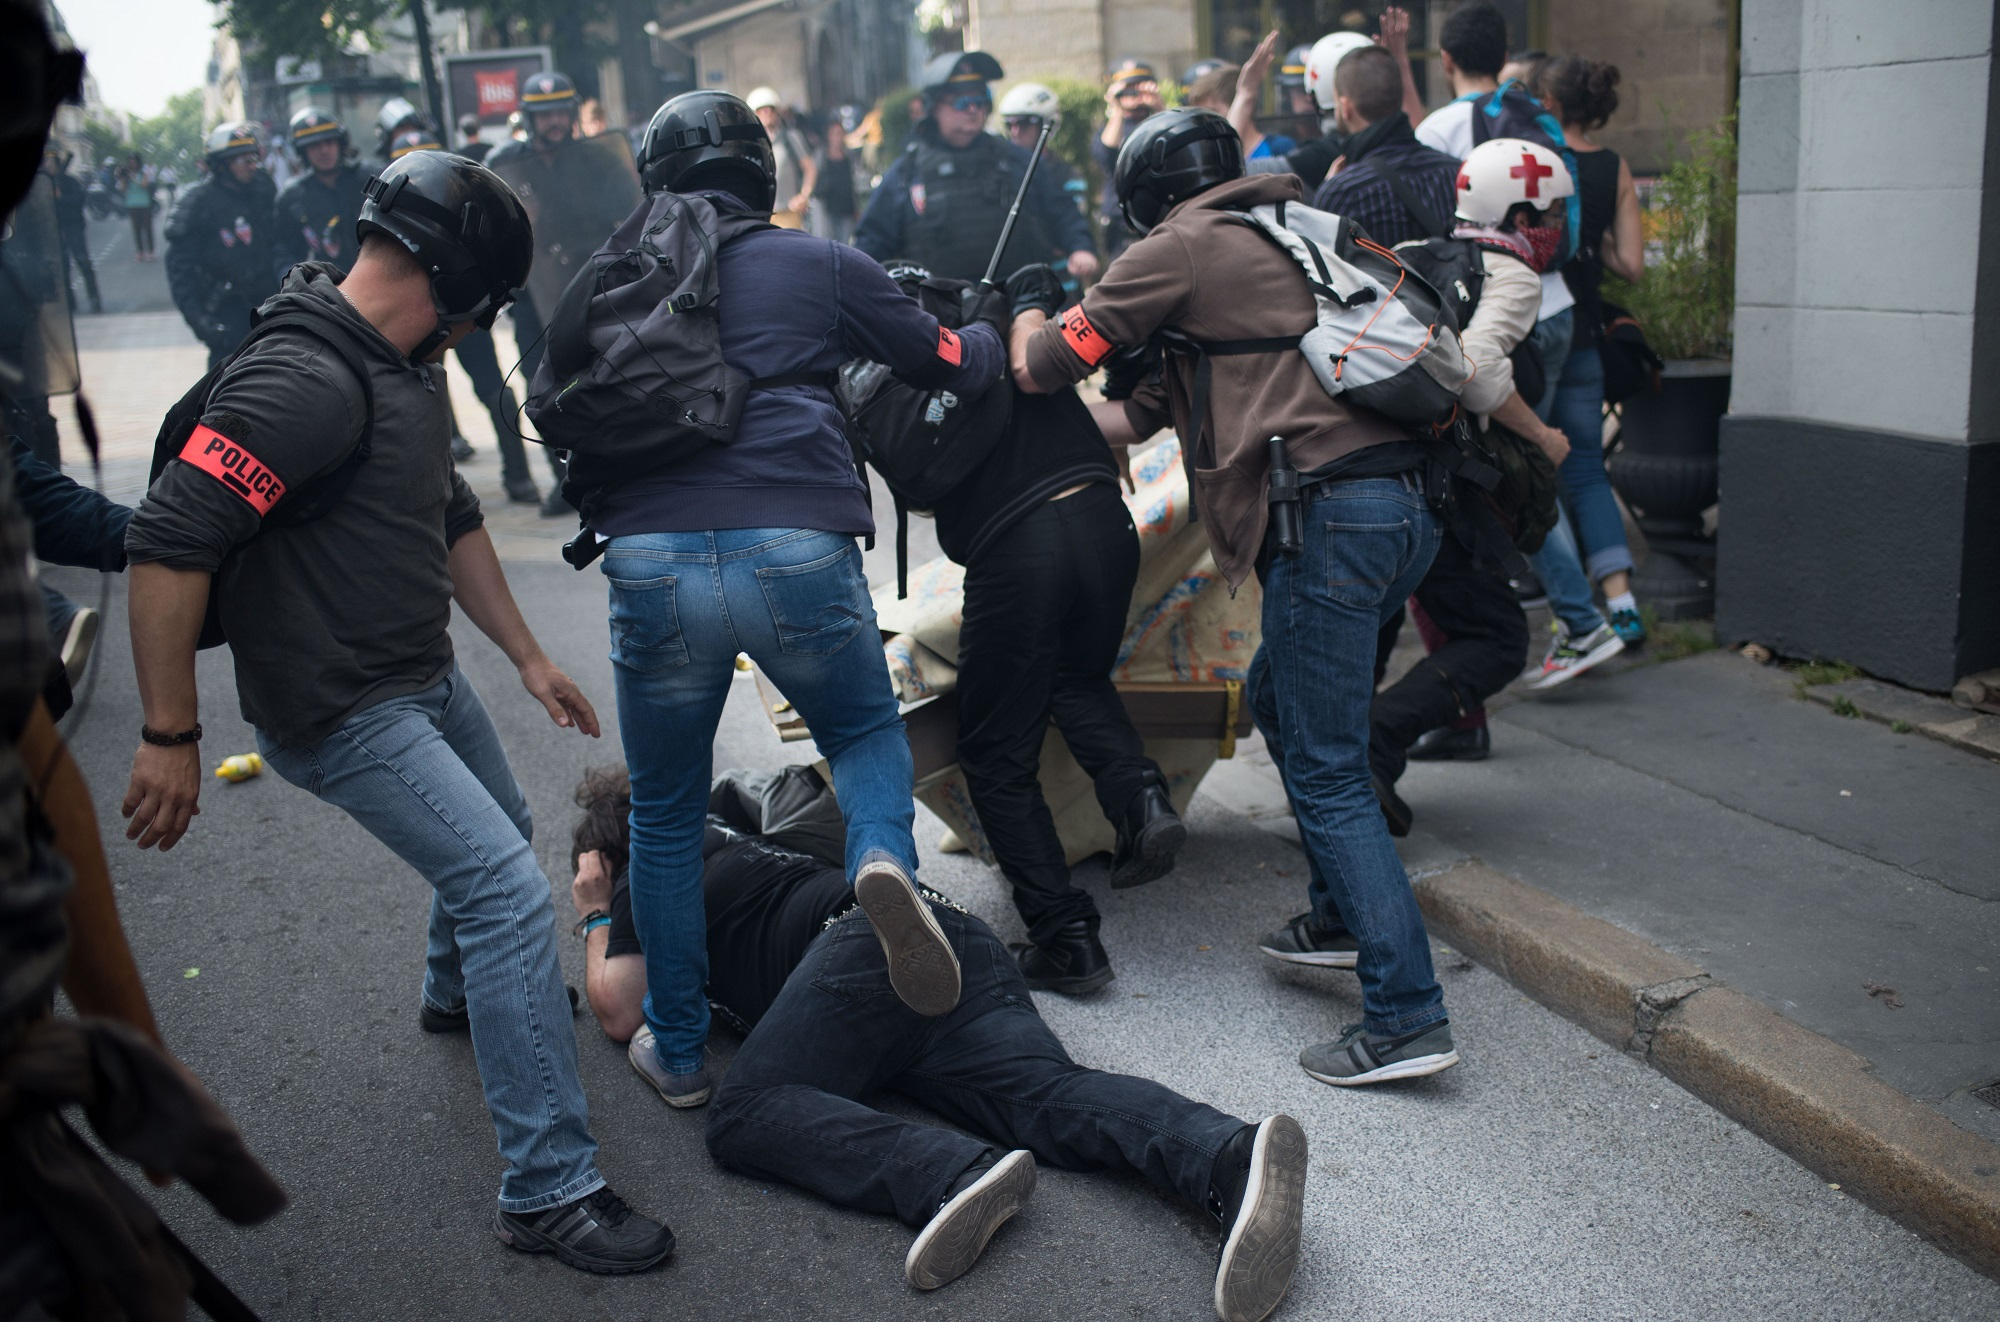 Arrestation et matraquage à Nantes